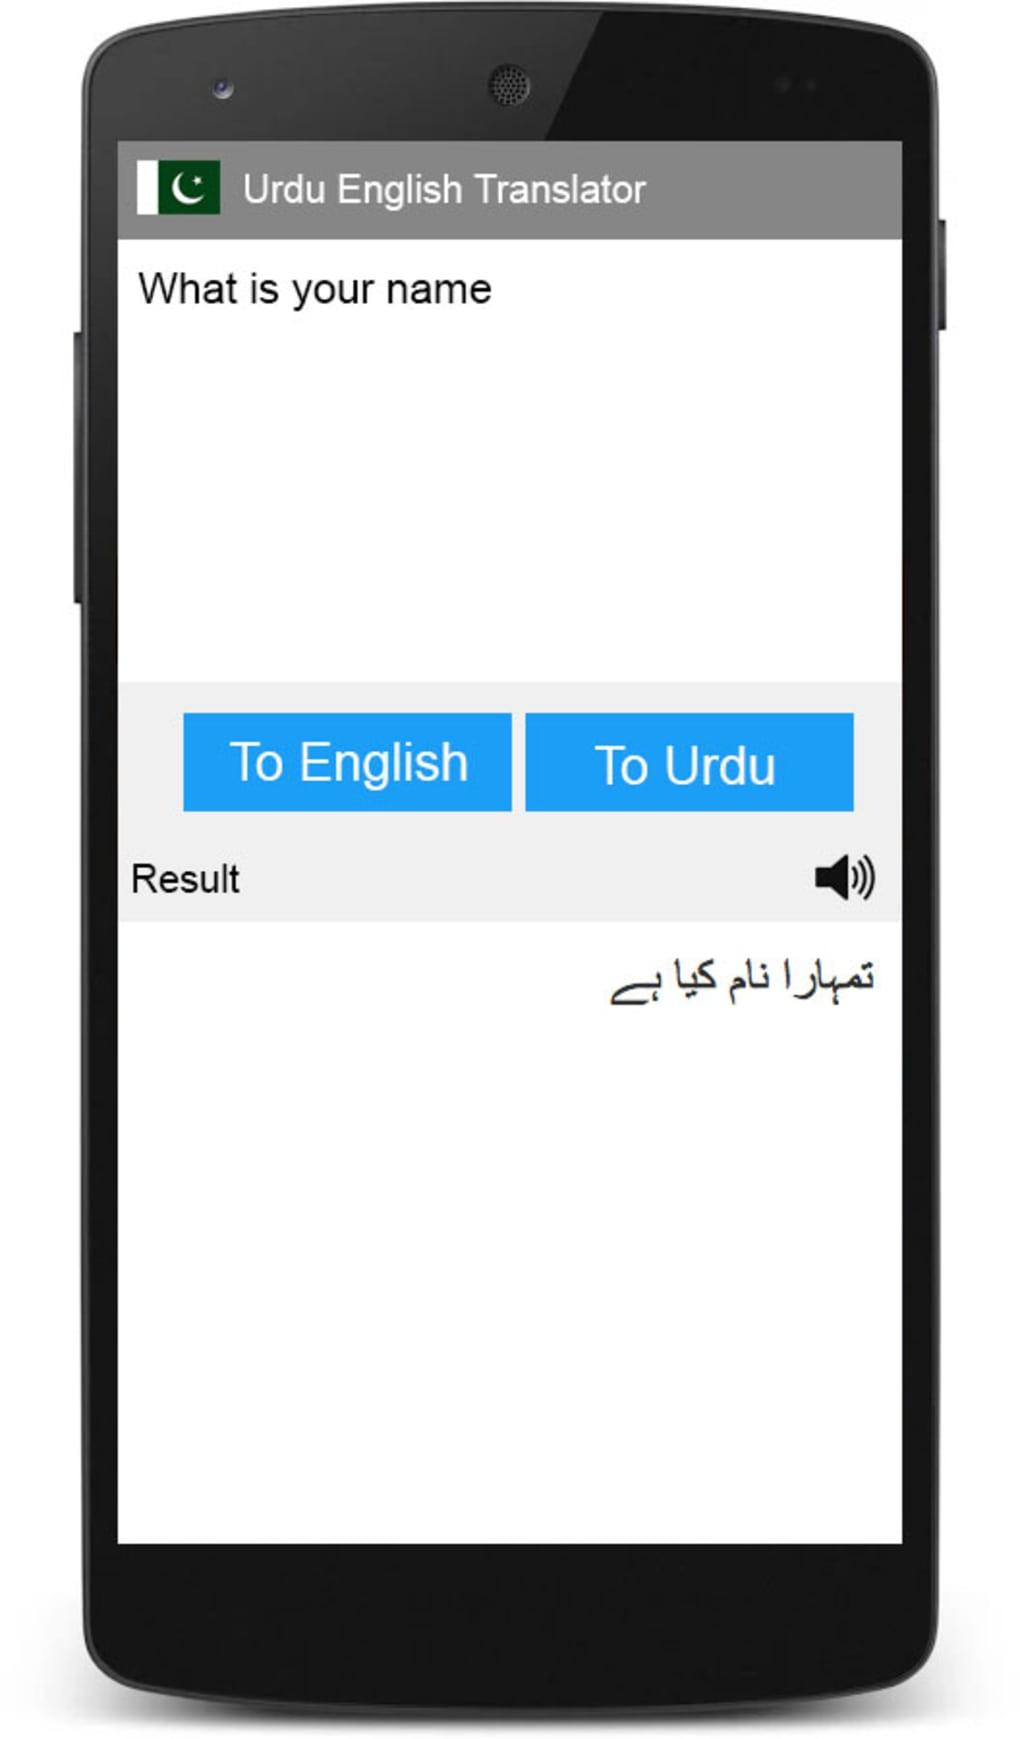 Urdu English Translator for Android - Download